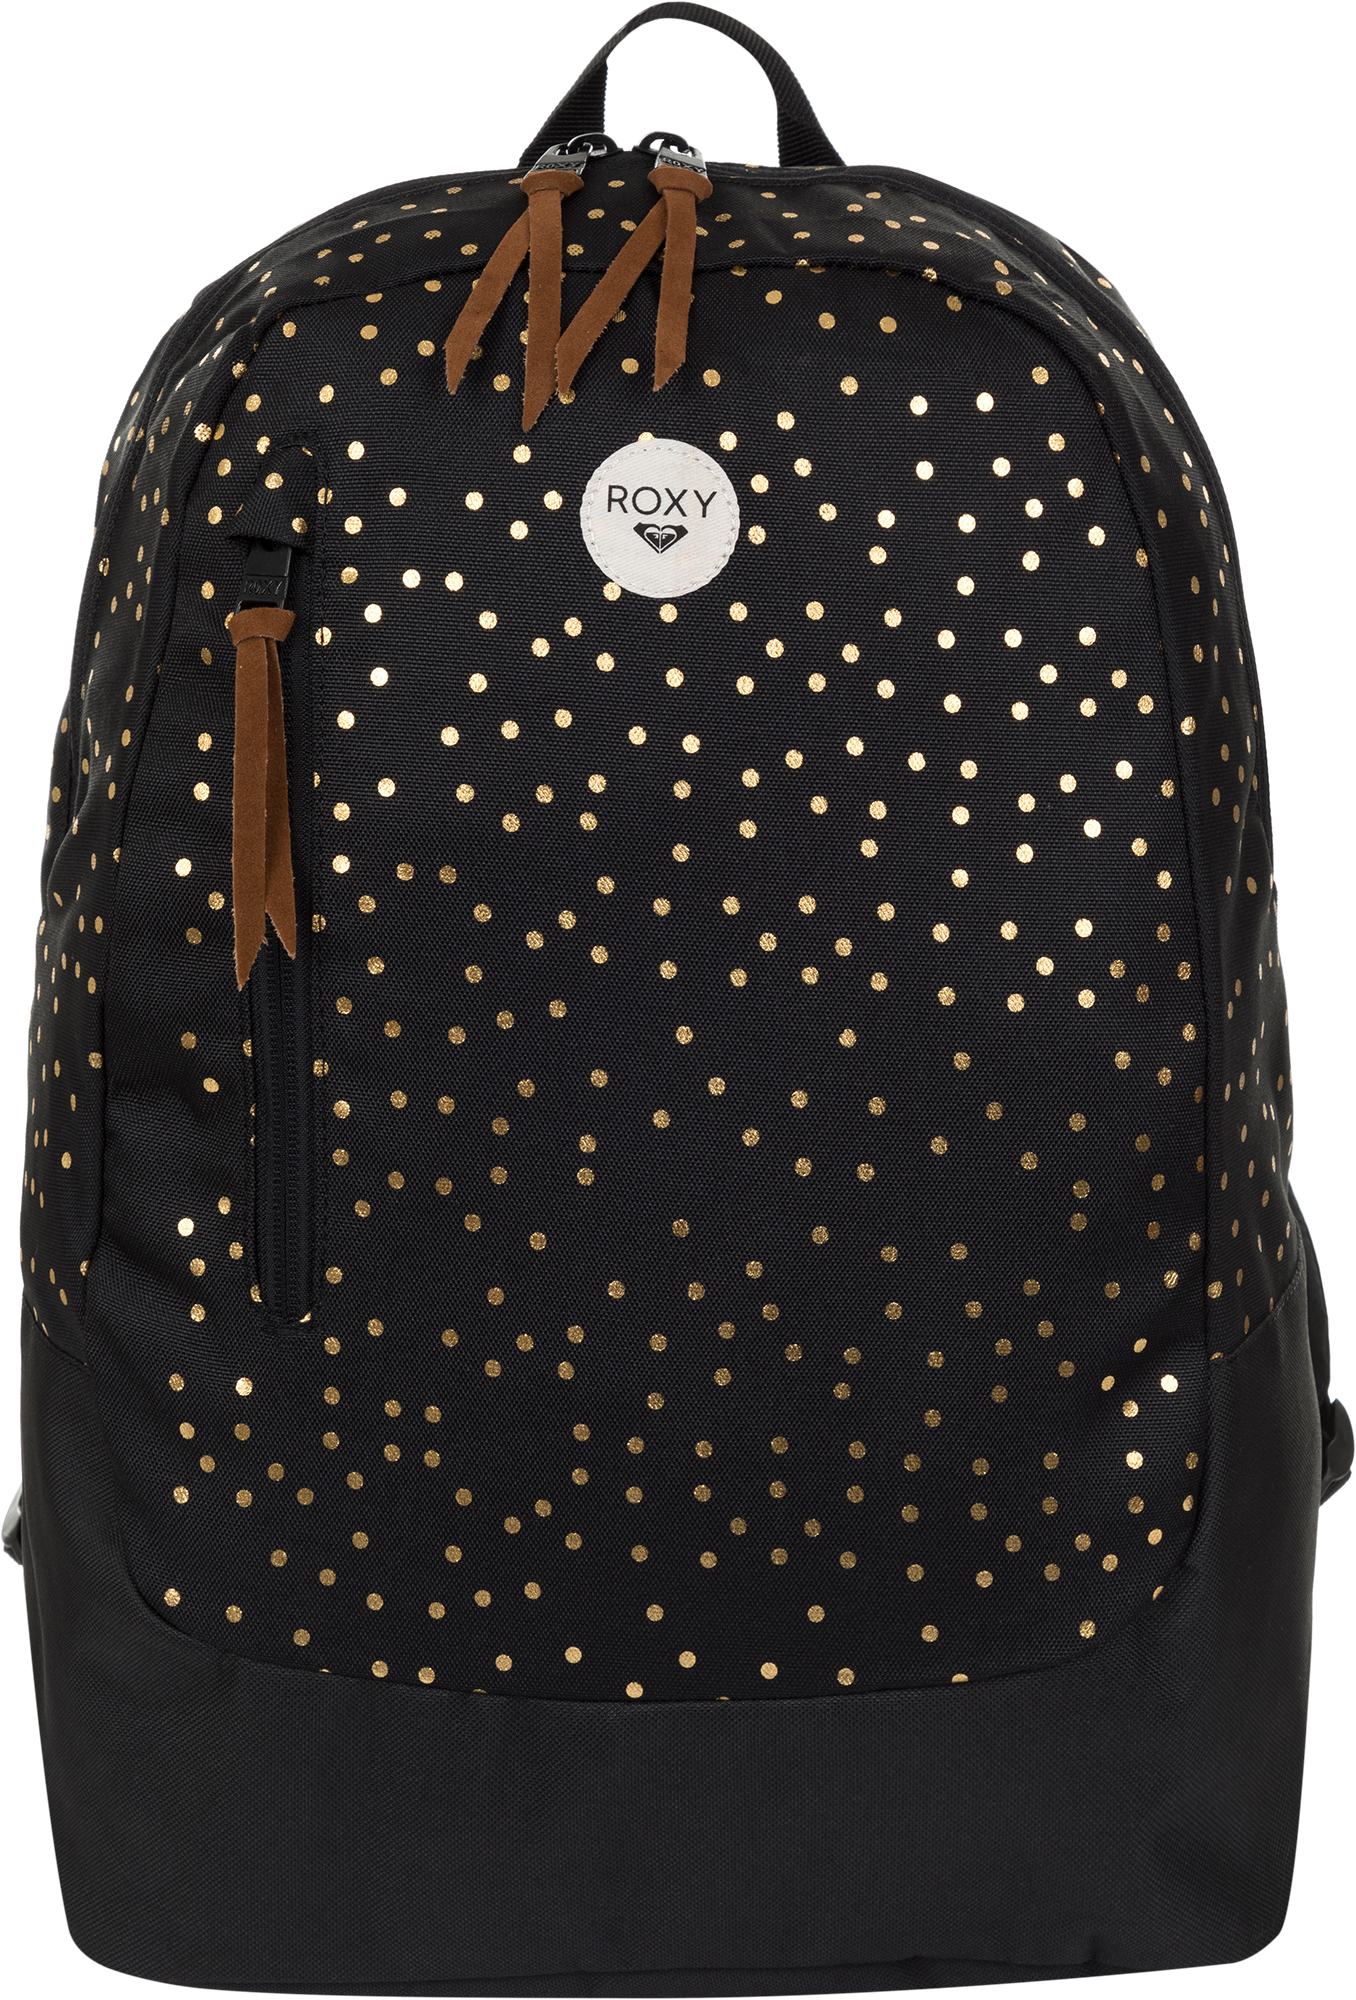 Roxy Рюкзак женский  Primerose  Gold Dots, размер Без размера